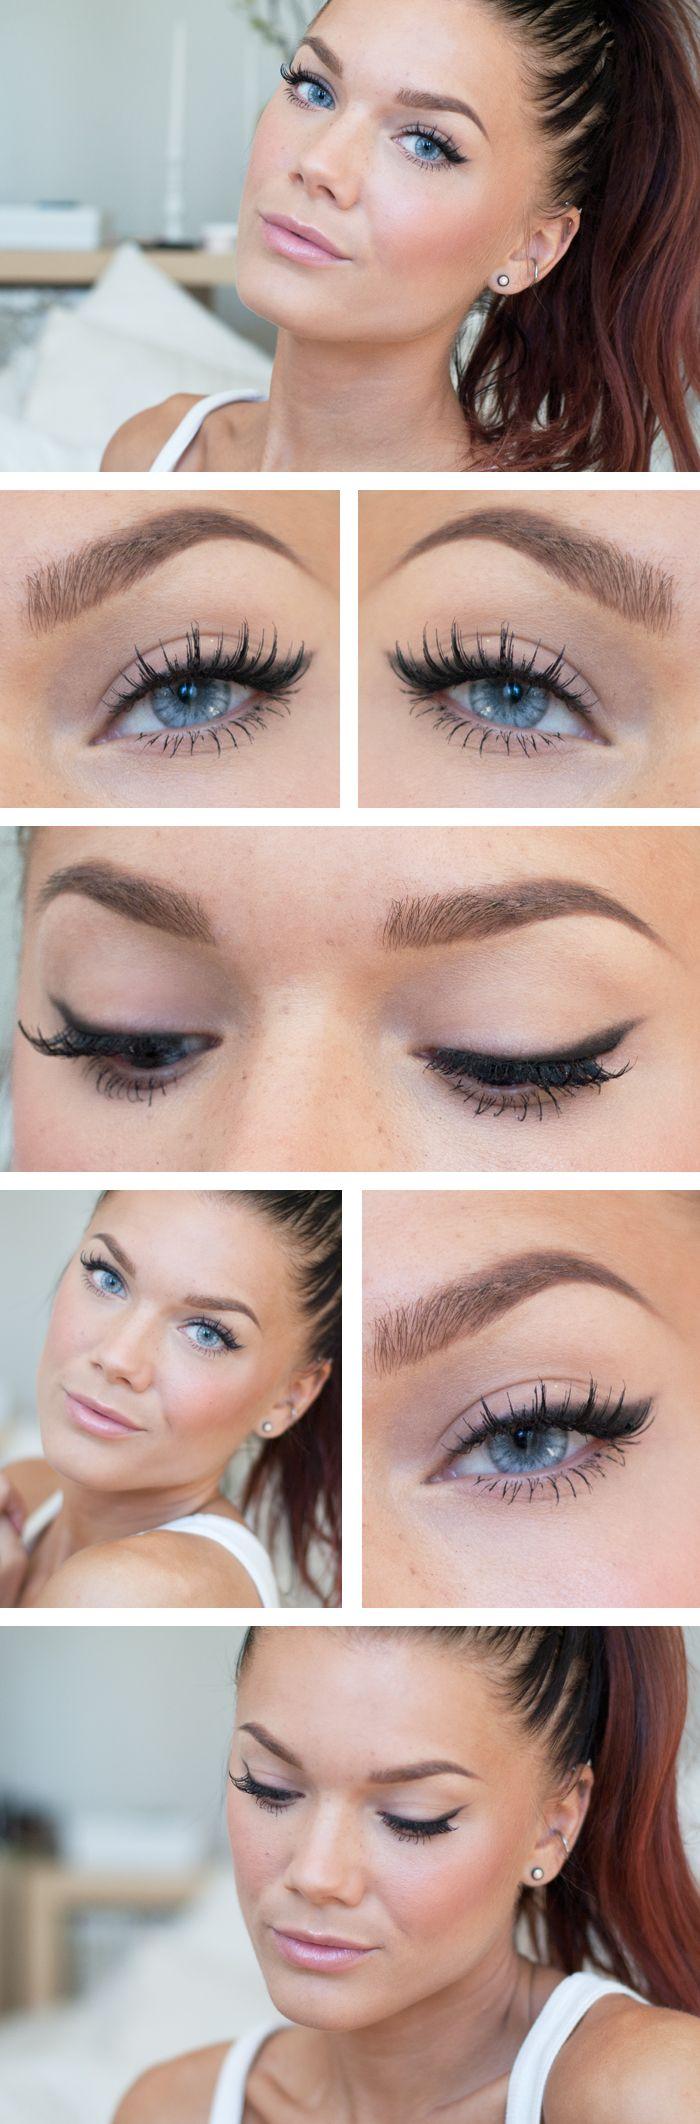 best images about light makeup on pinterest erin heatherton